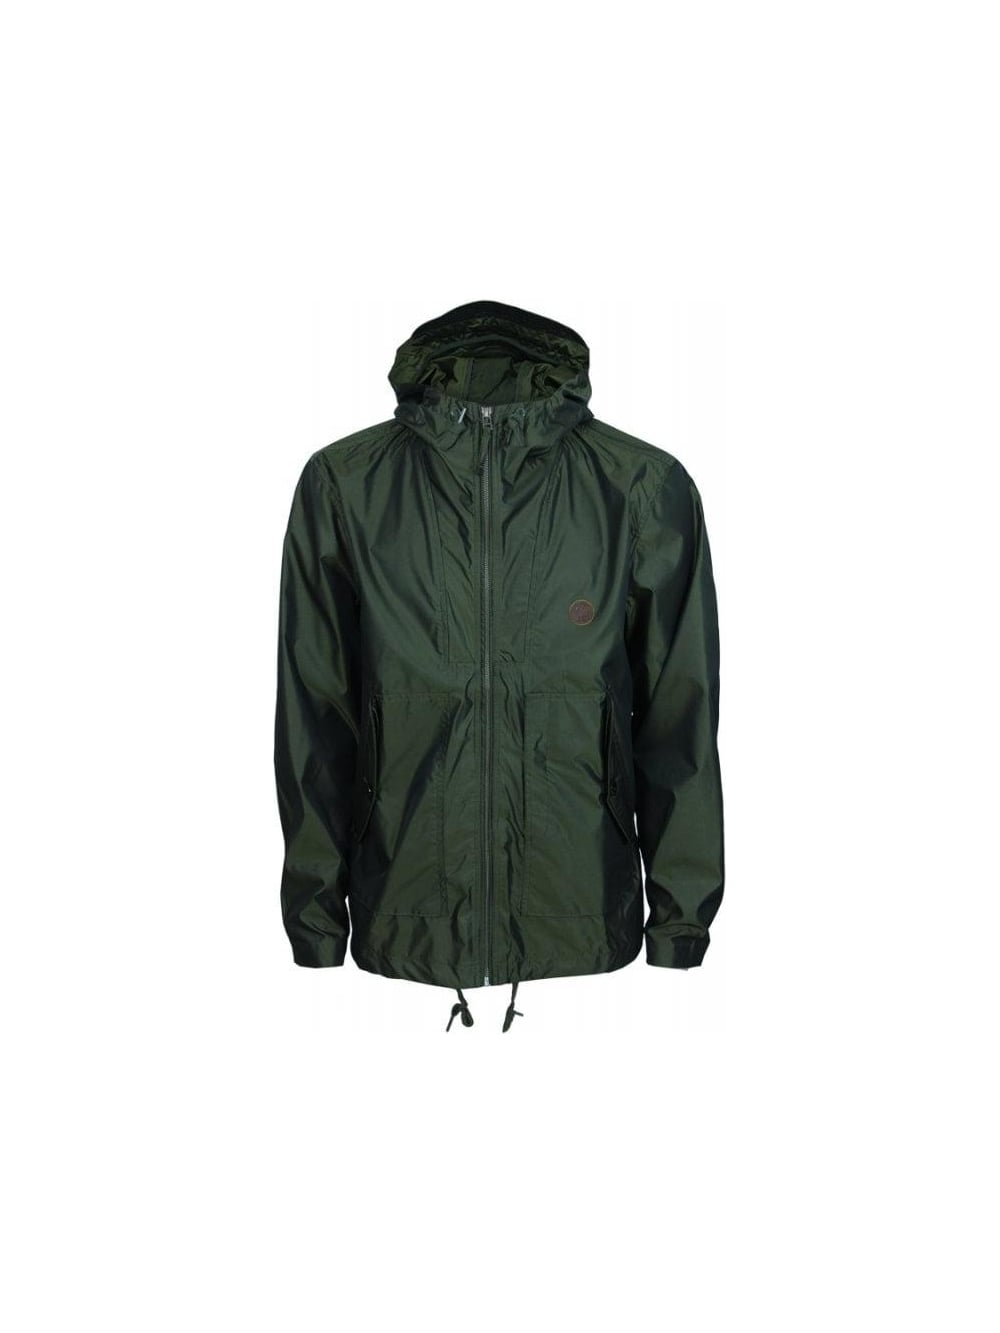 8cb9eb01ad3 Pretty Green Danbury Jacket in Khaki - Northern Threads